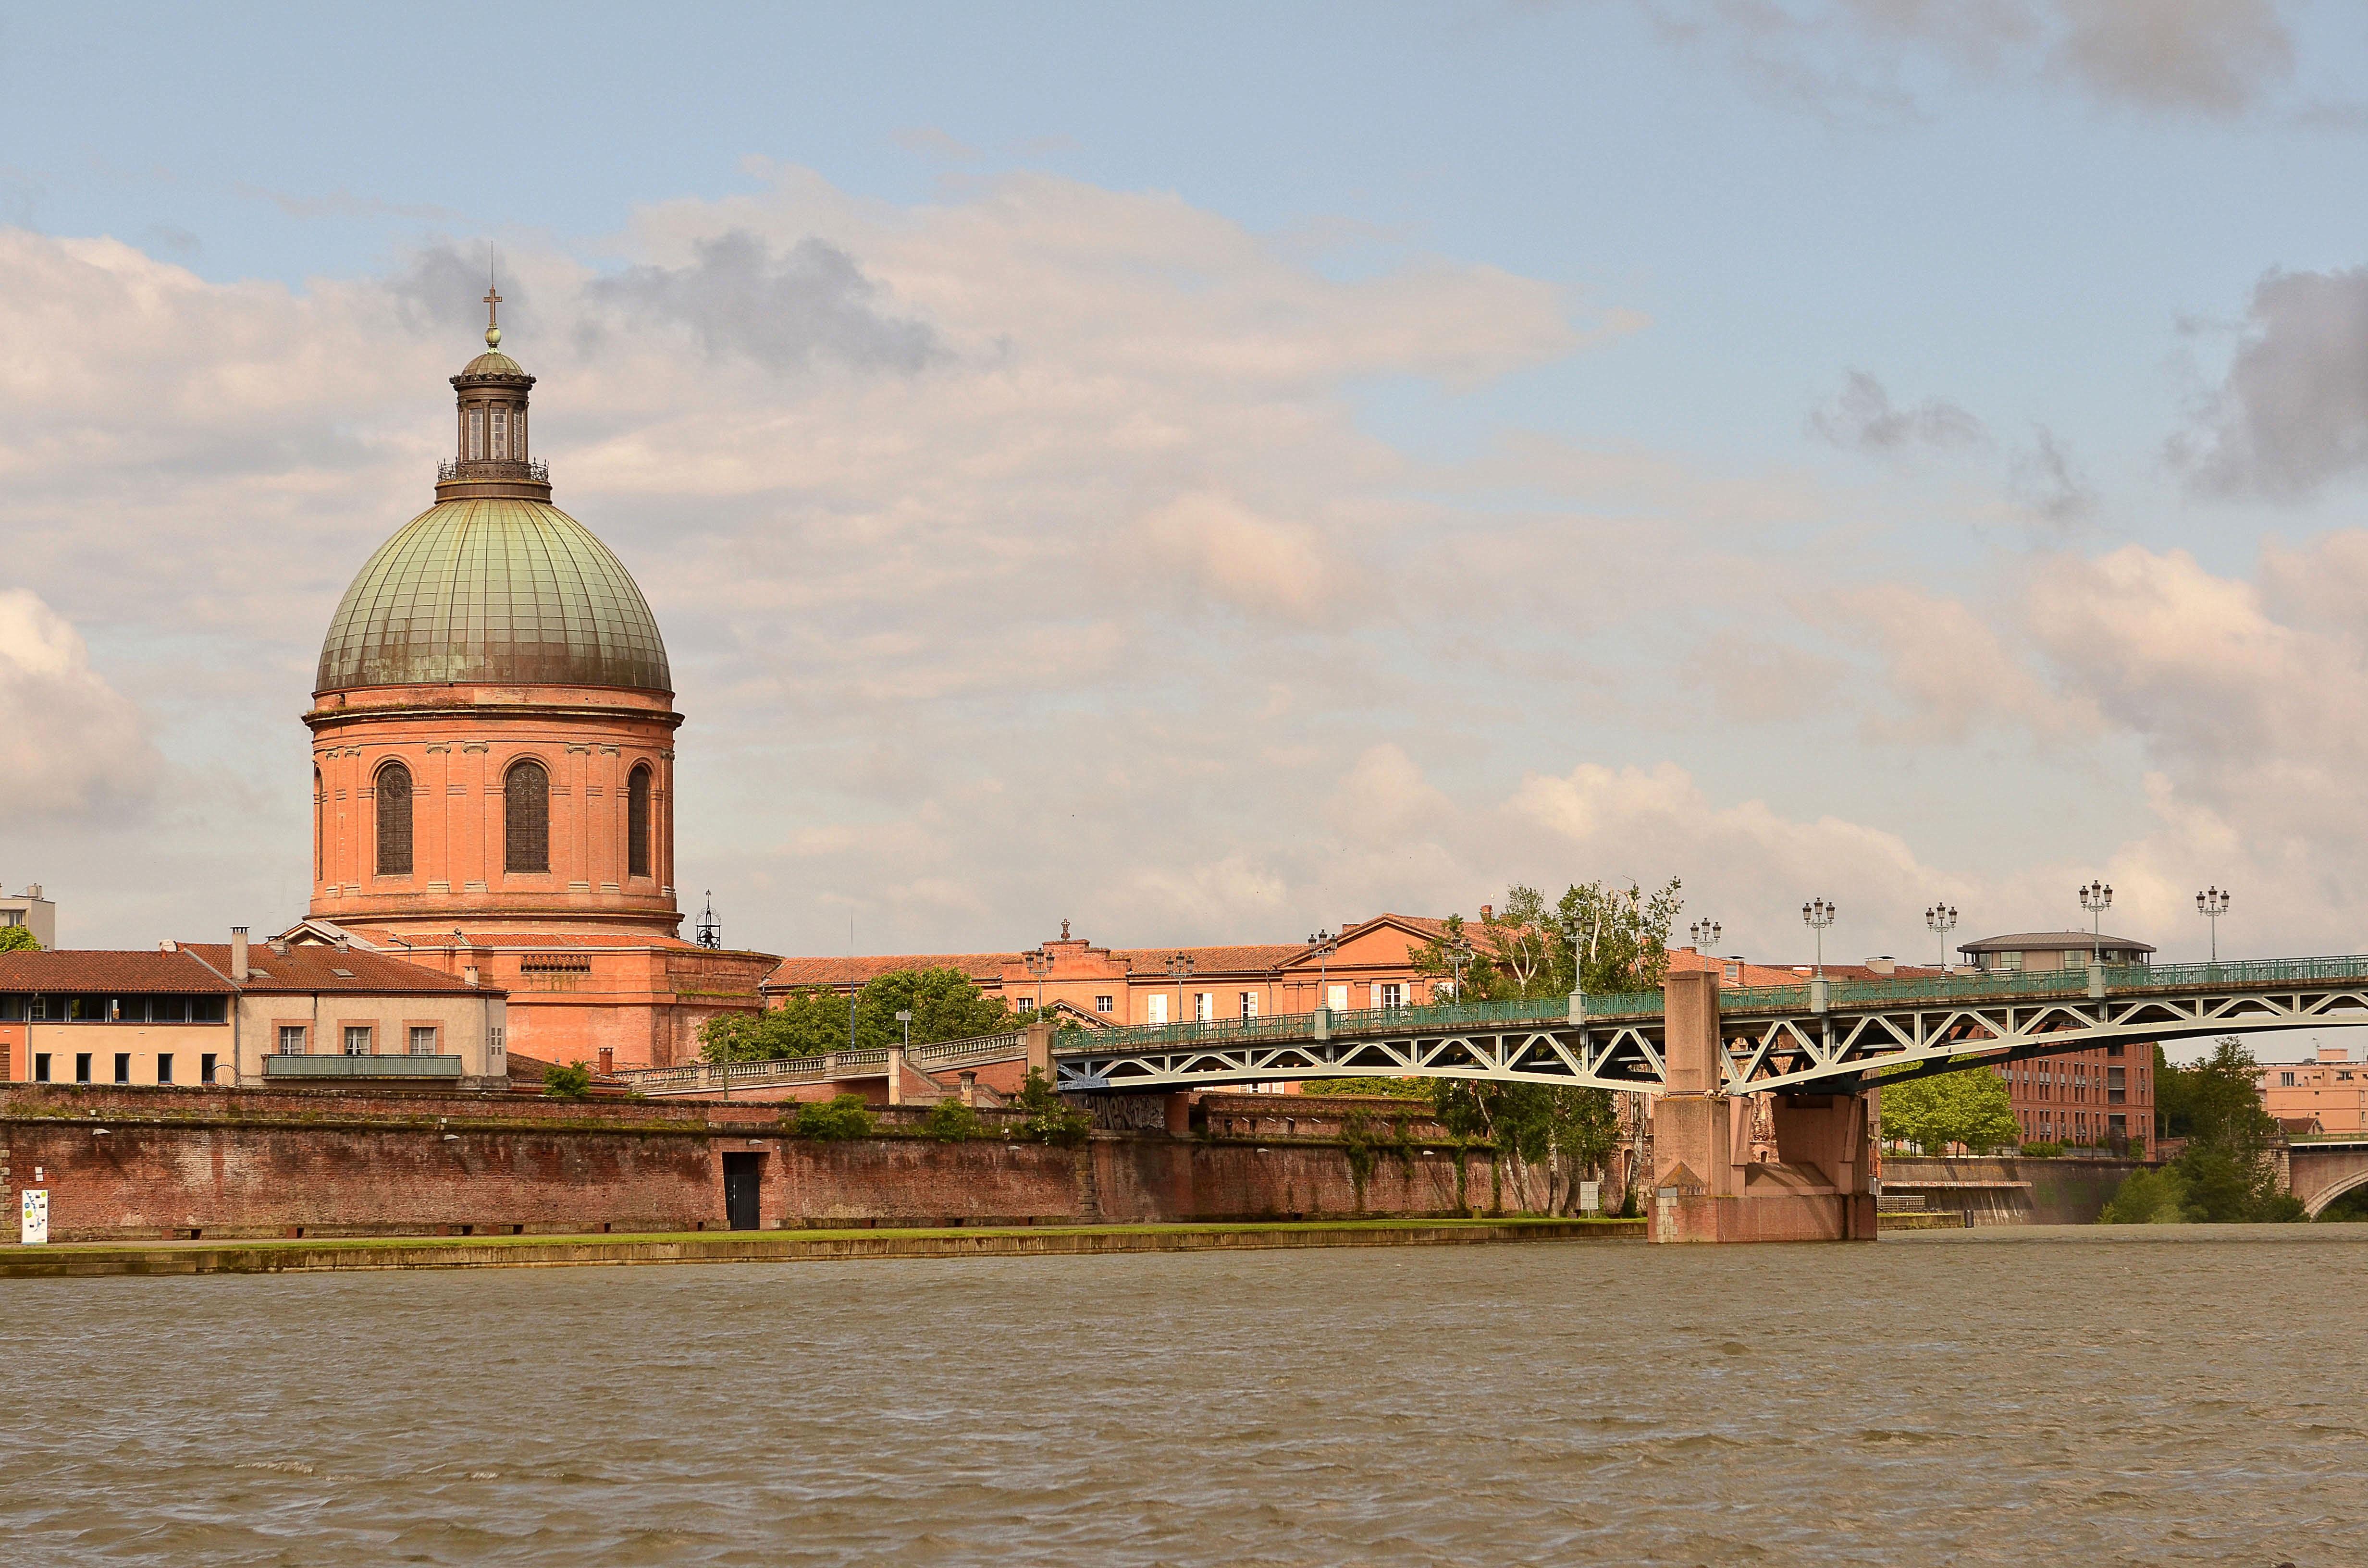 Escort De Luxe Toulouse